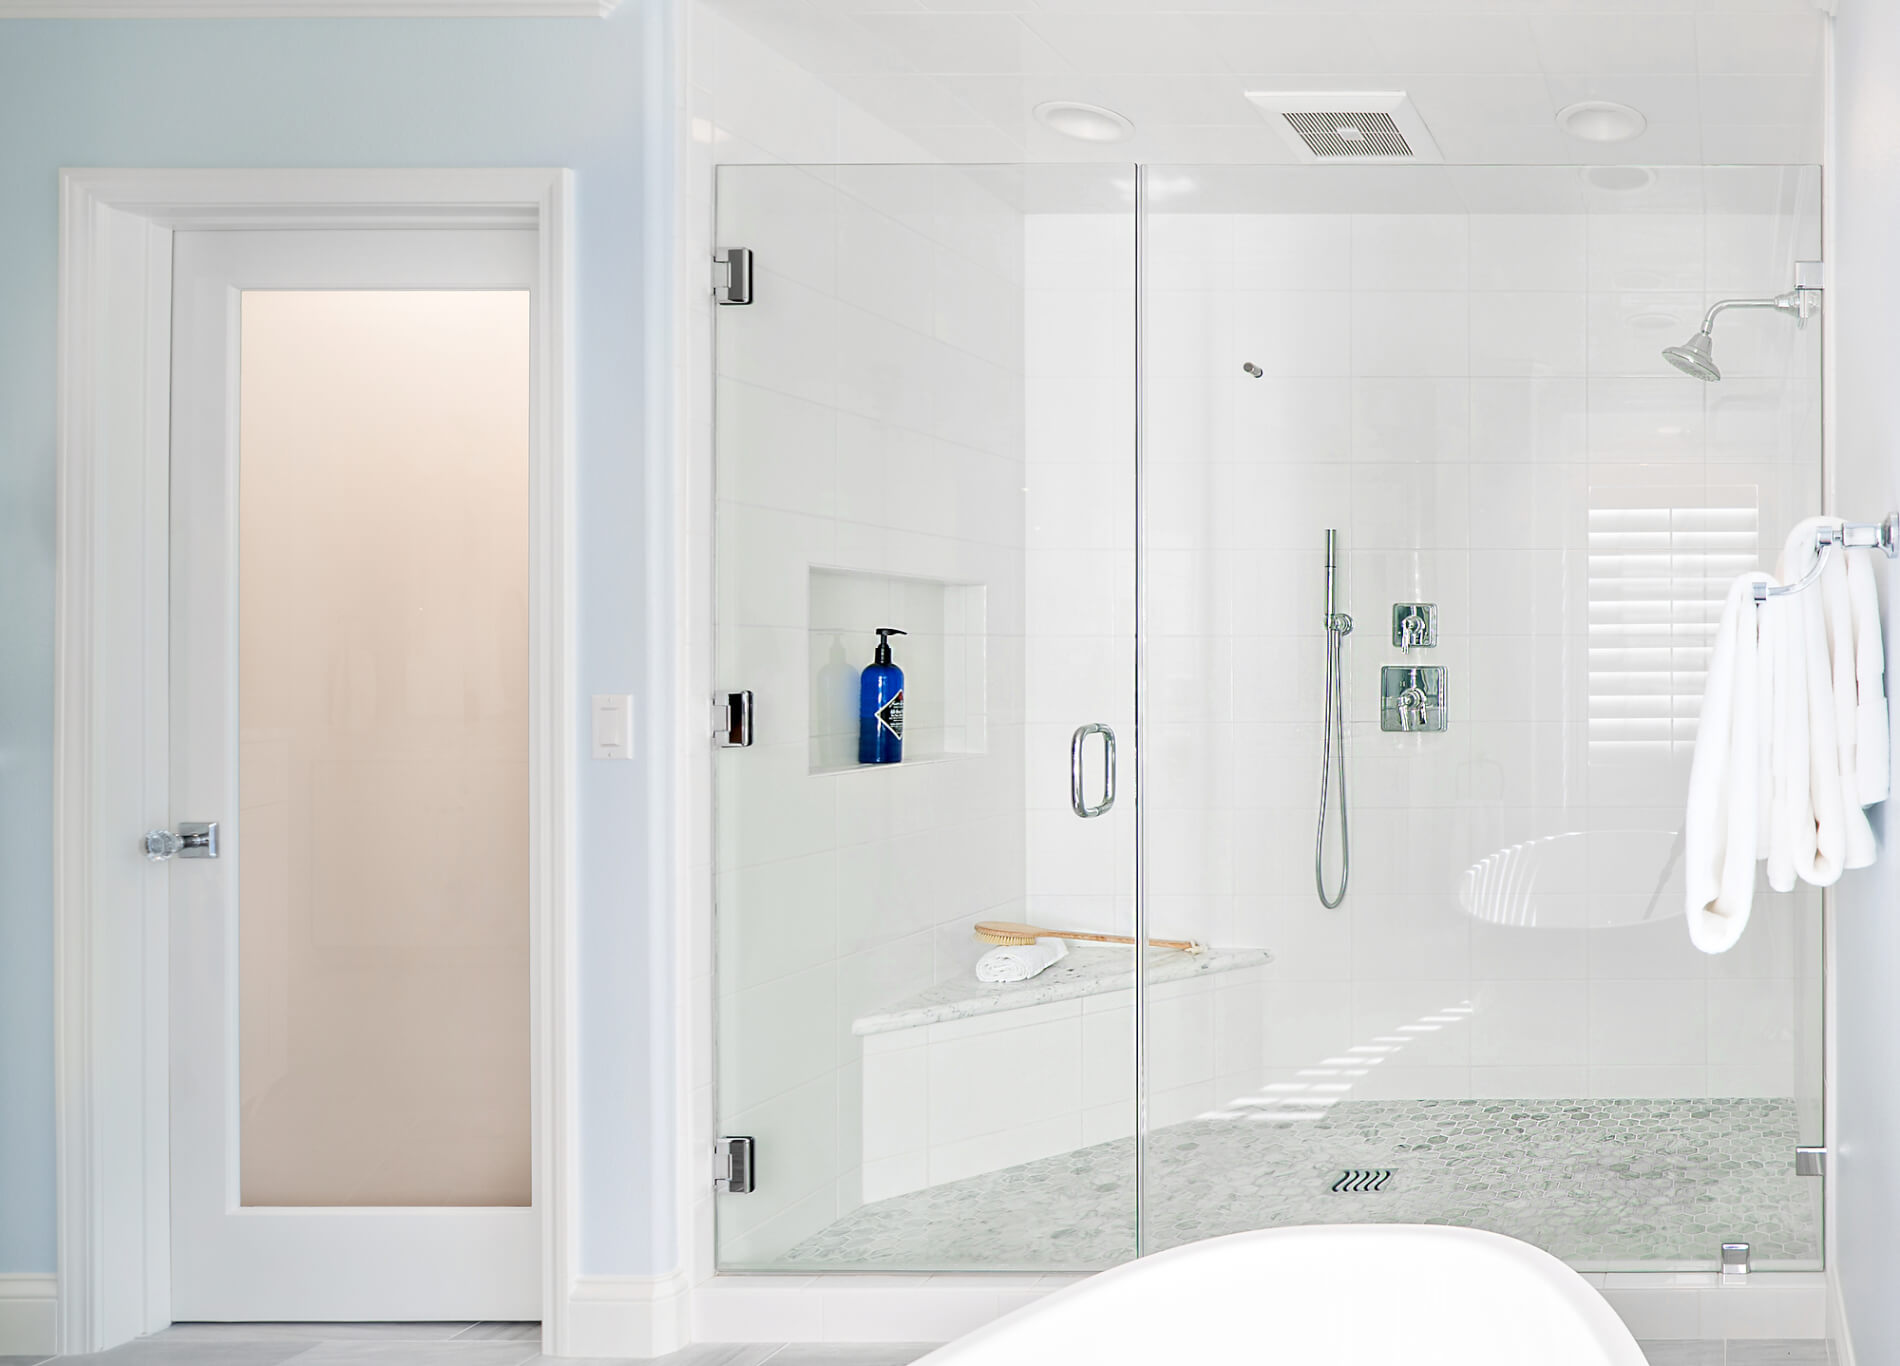 Home Remodeling Companies, Bathroom Cabinets, Bathroom Remodeling Orange County